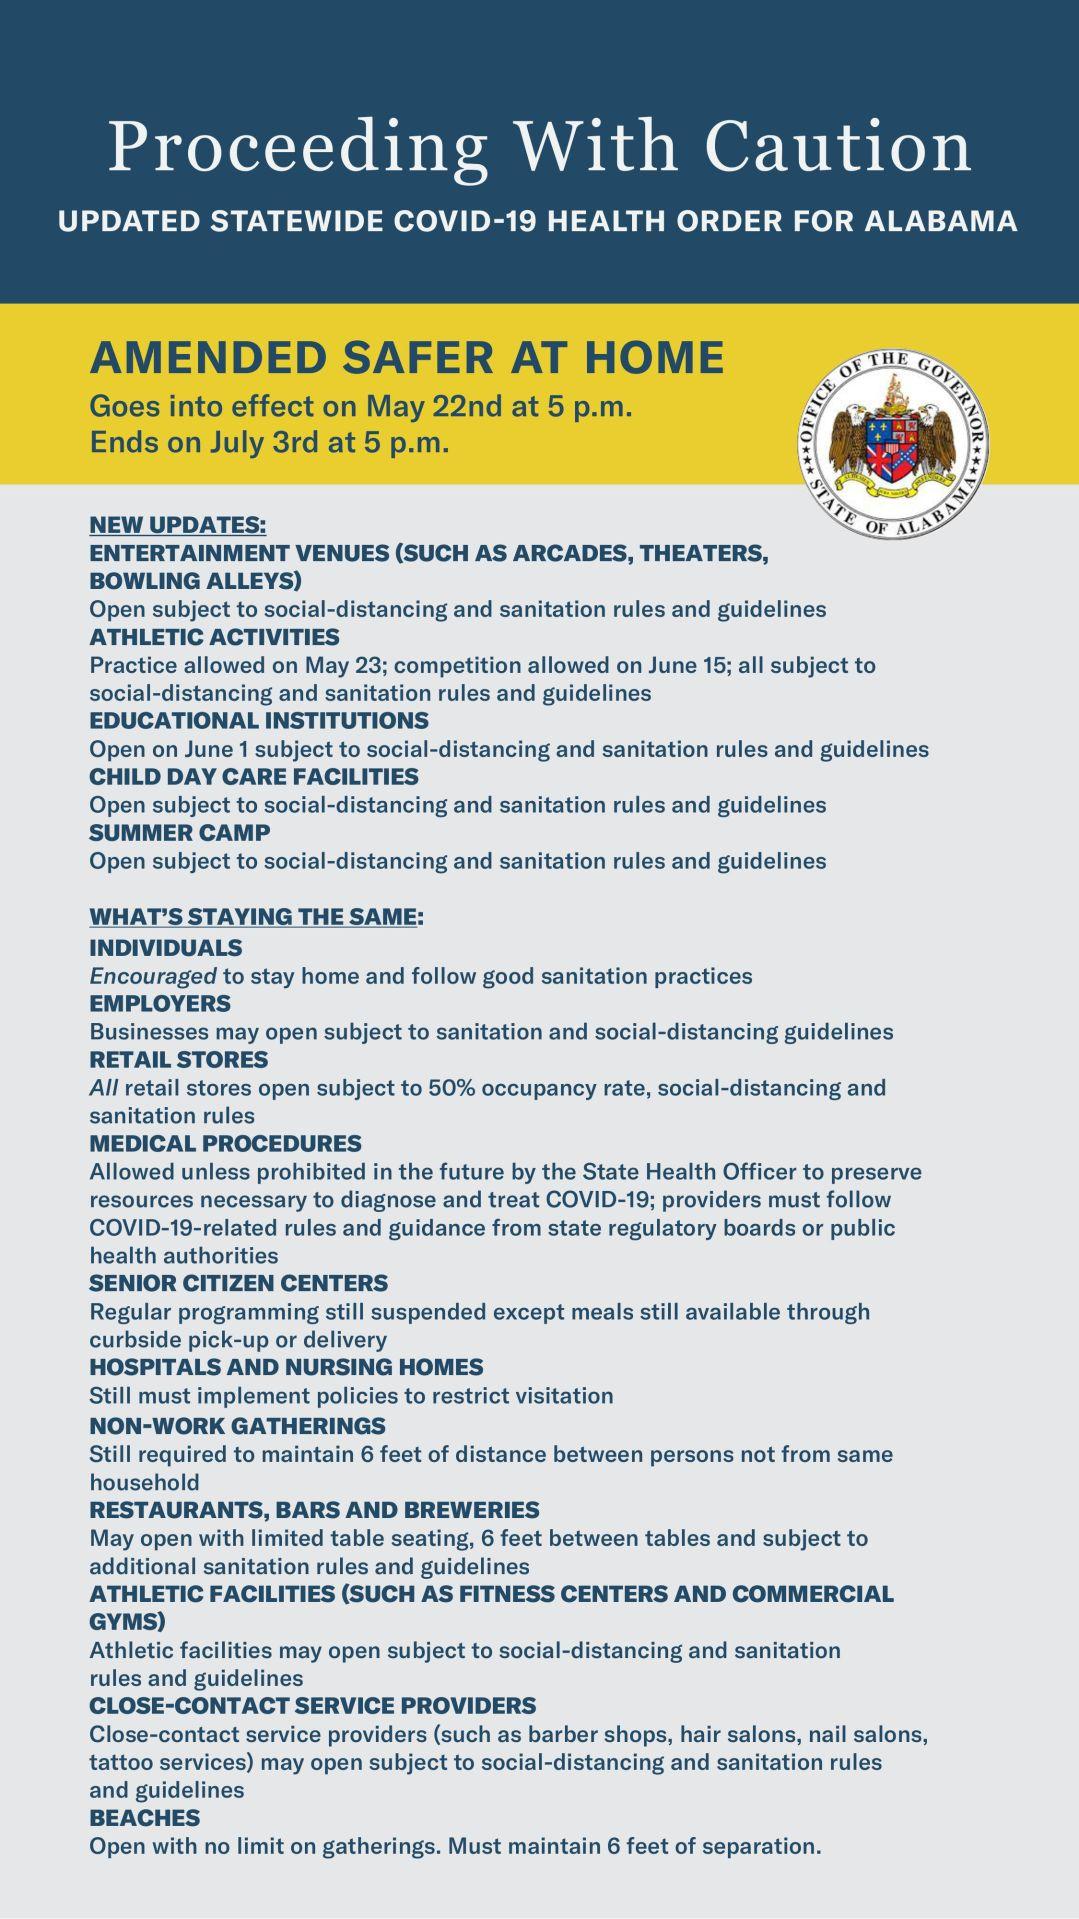 GKI-0040-2020 Health Order Update May 22-DFT4-Vertical Info Sheet.pdf